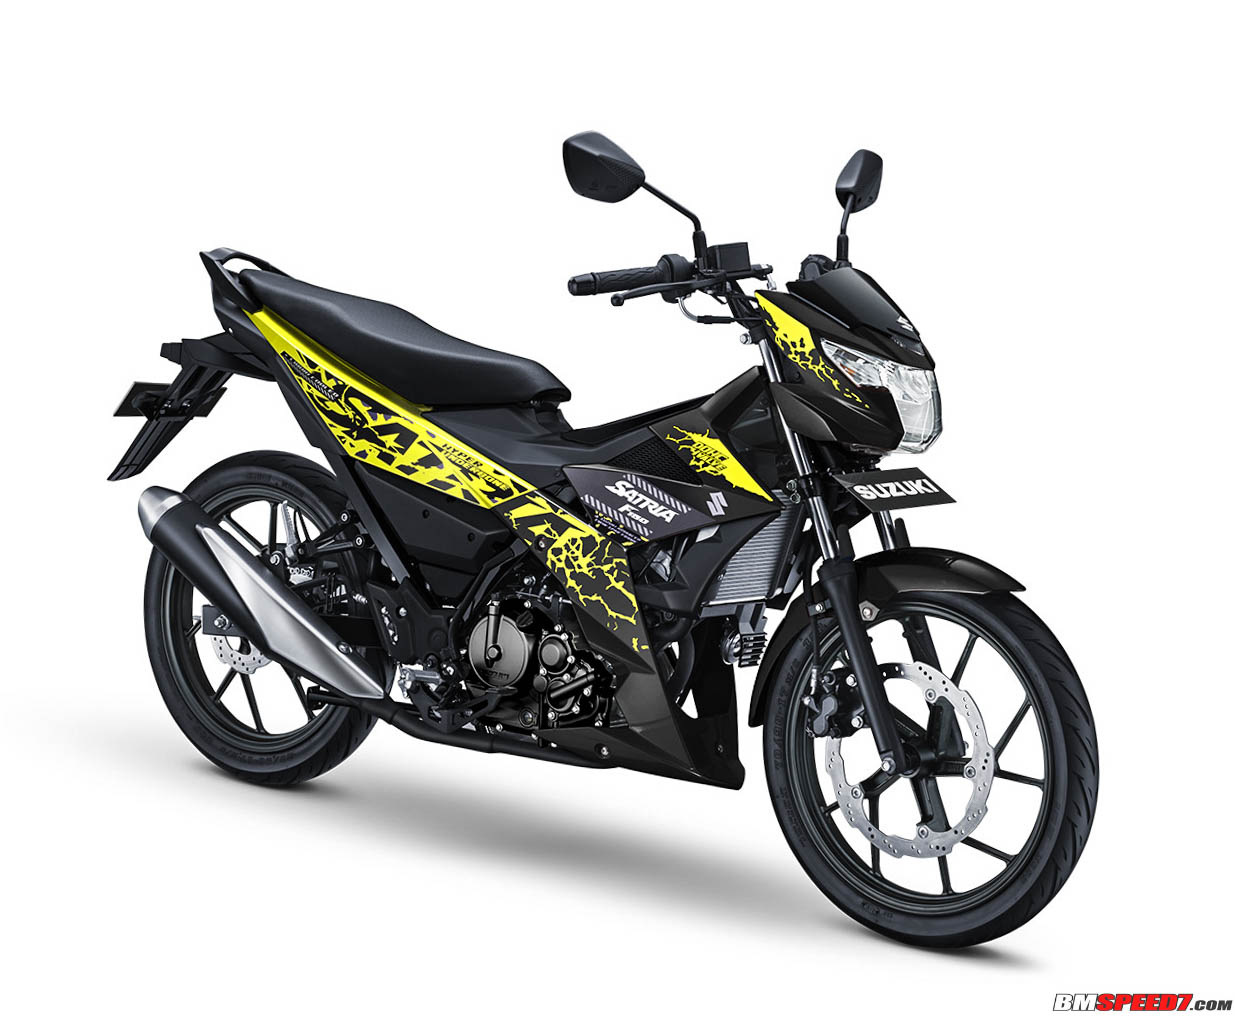 6 Pilihan Warna Suzuki Satria Fu Terbaru 2018 Harga Rp 22 Jutaan